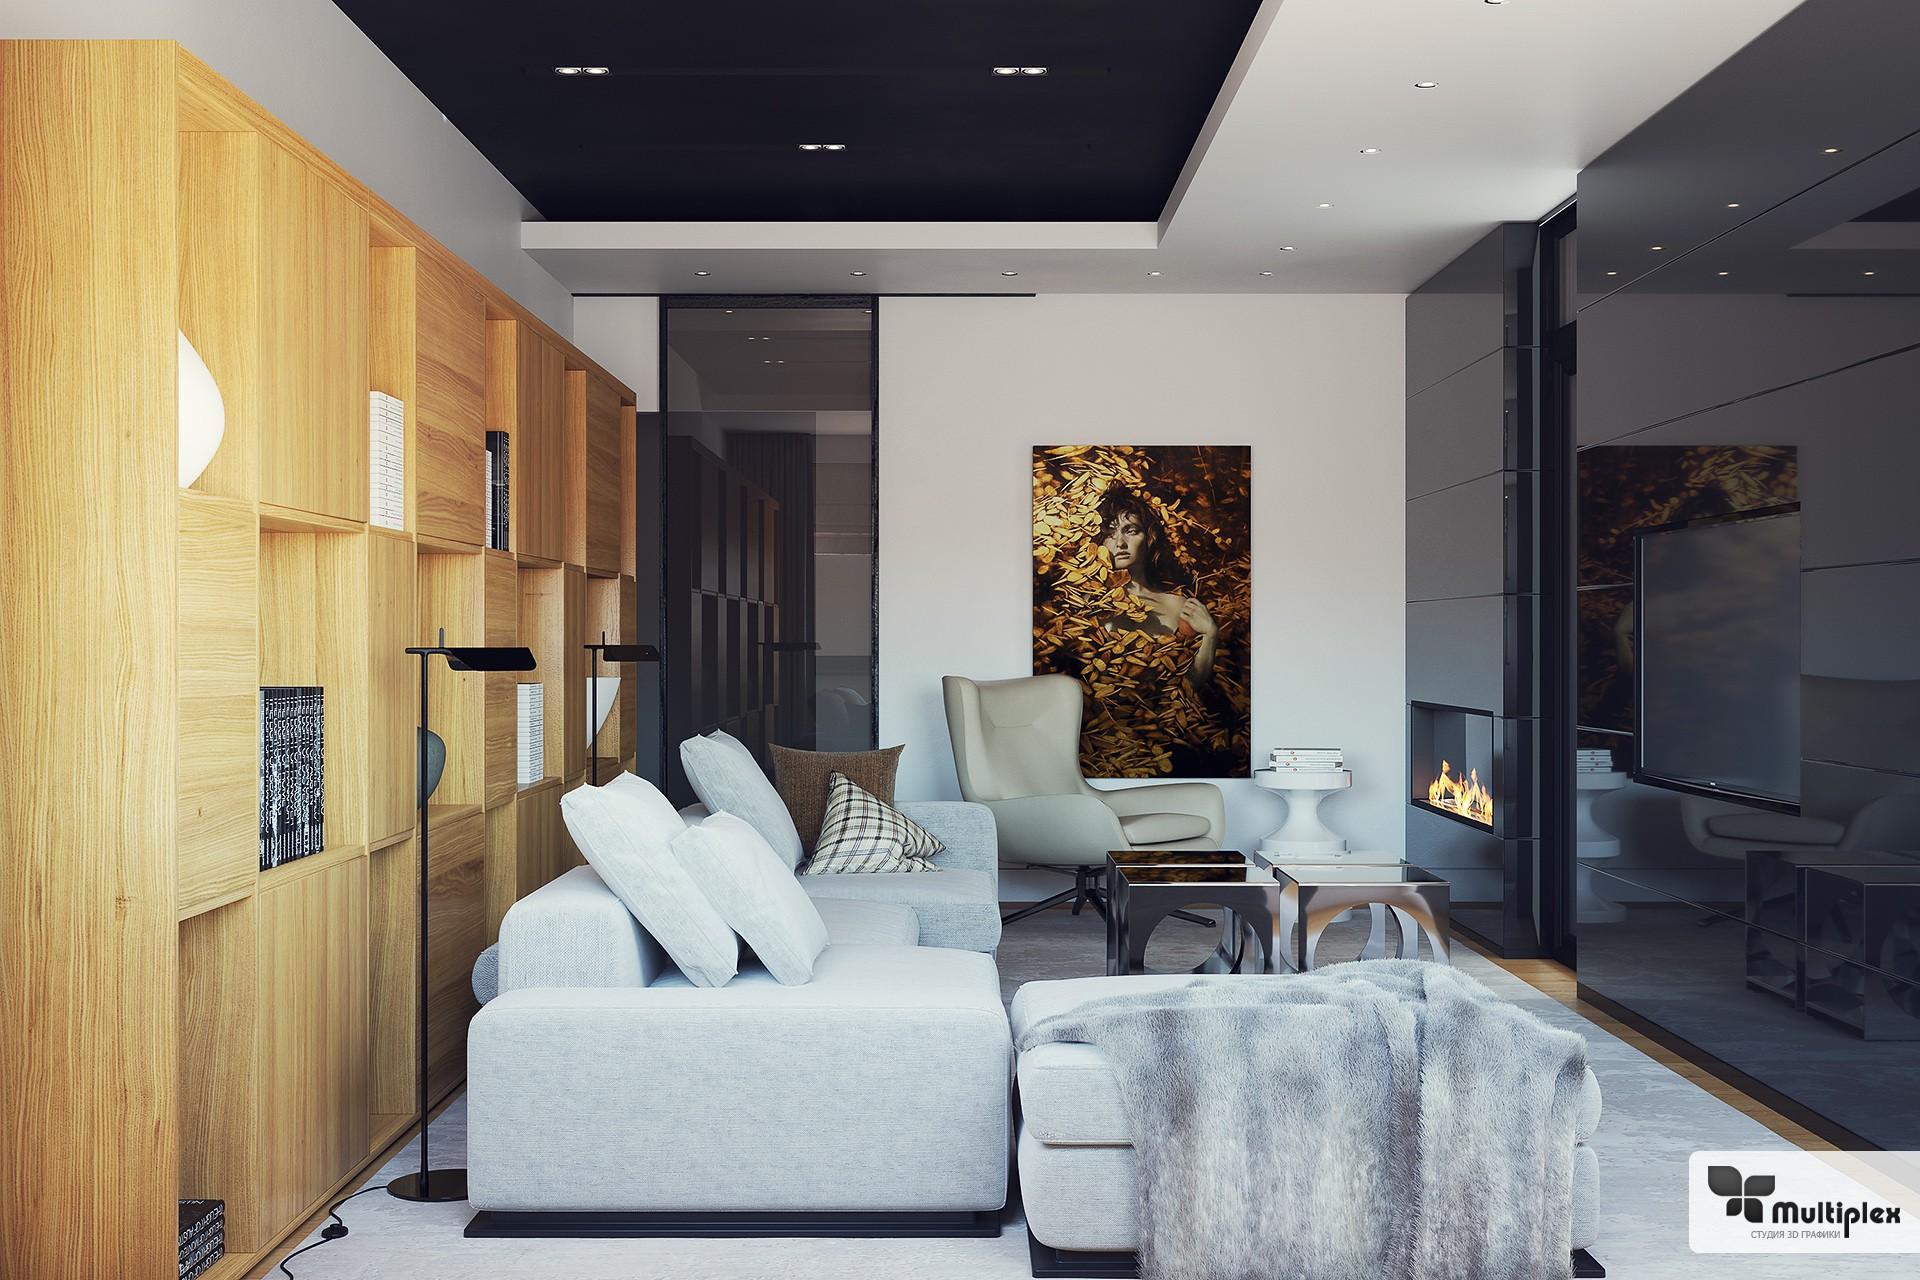 3D визуализация интерьера в стиле Арт-хаус